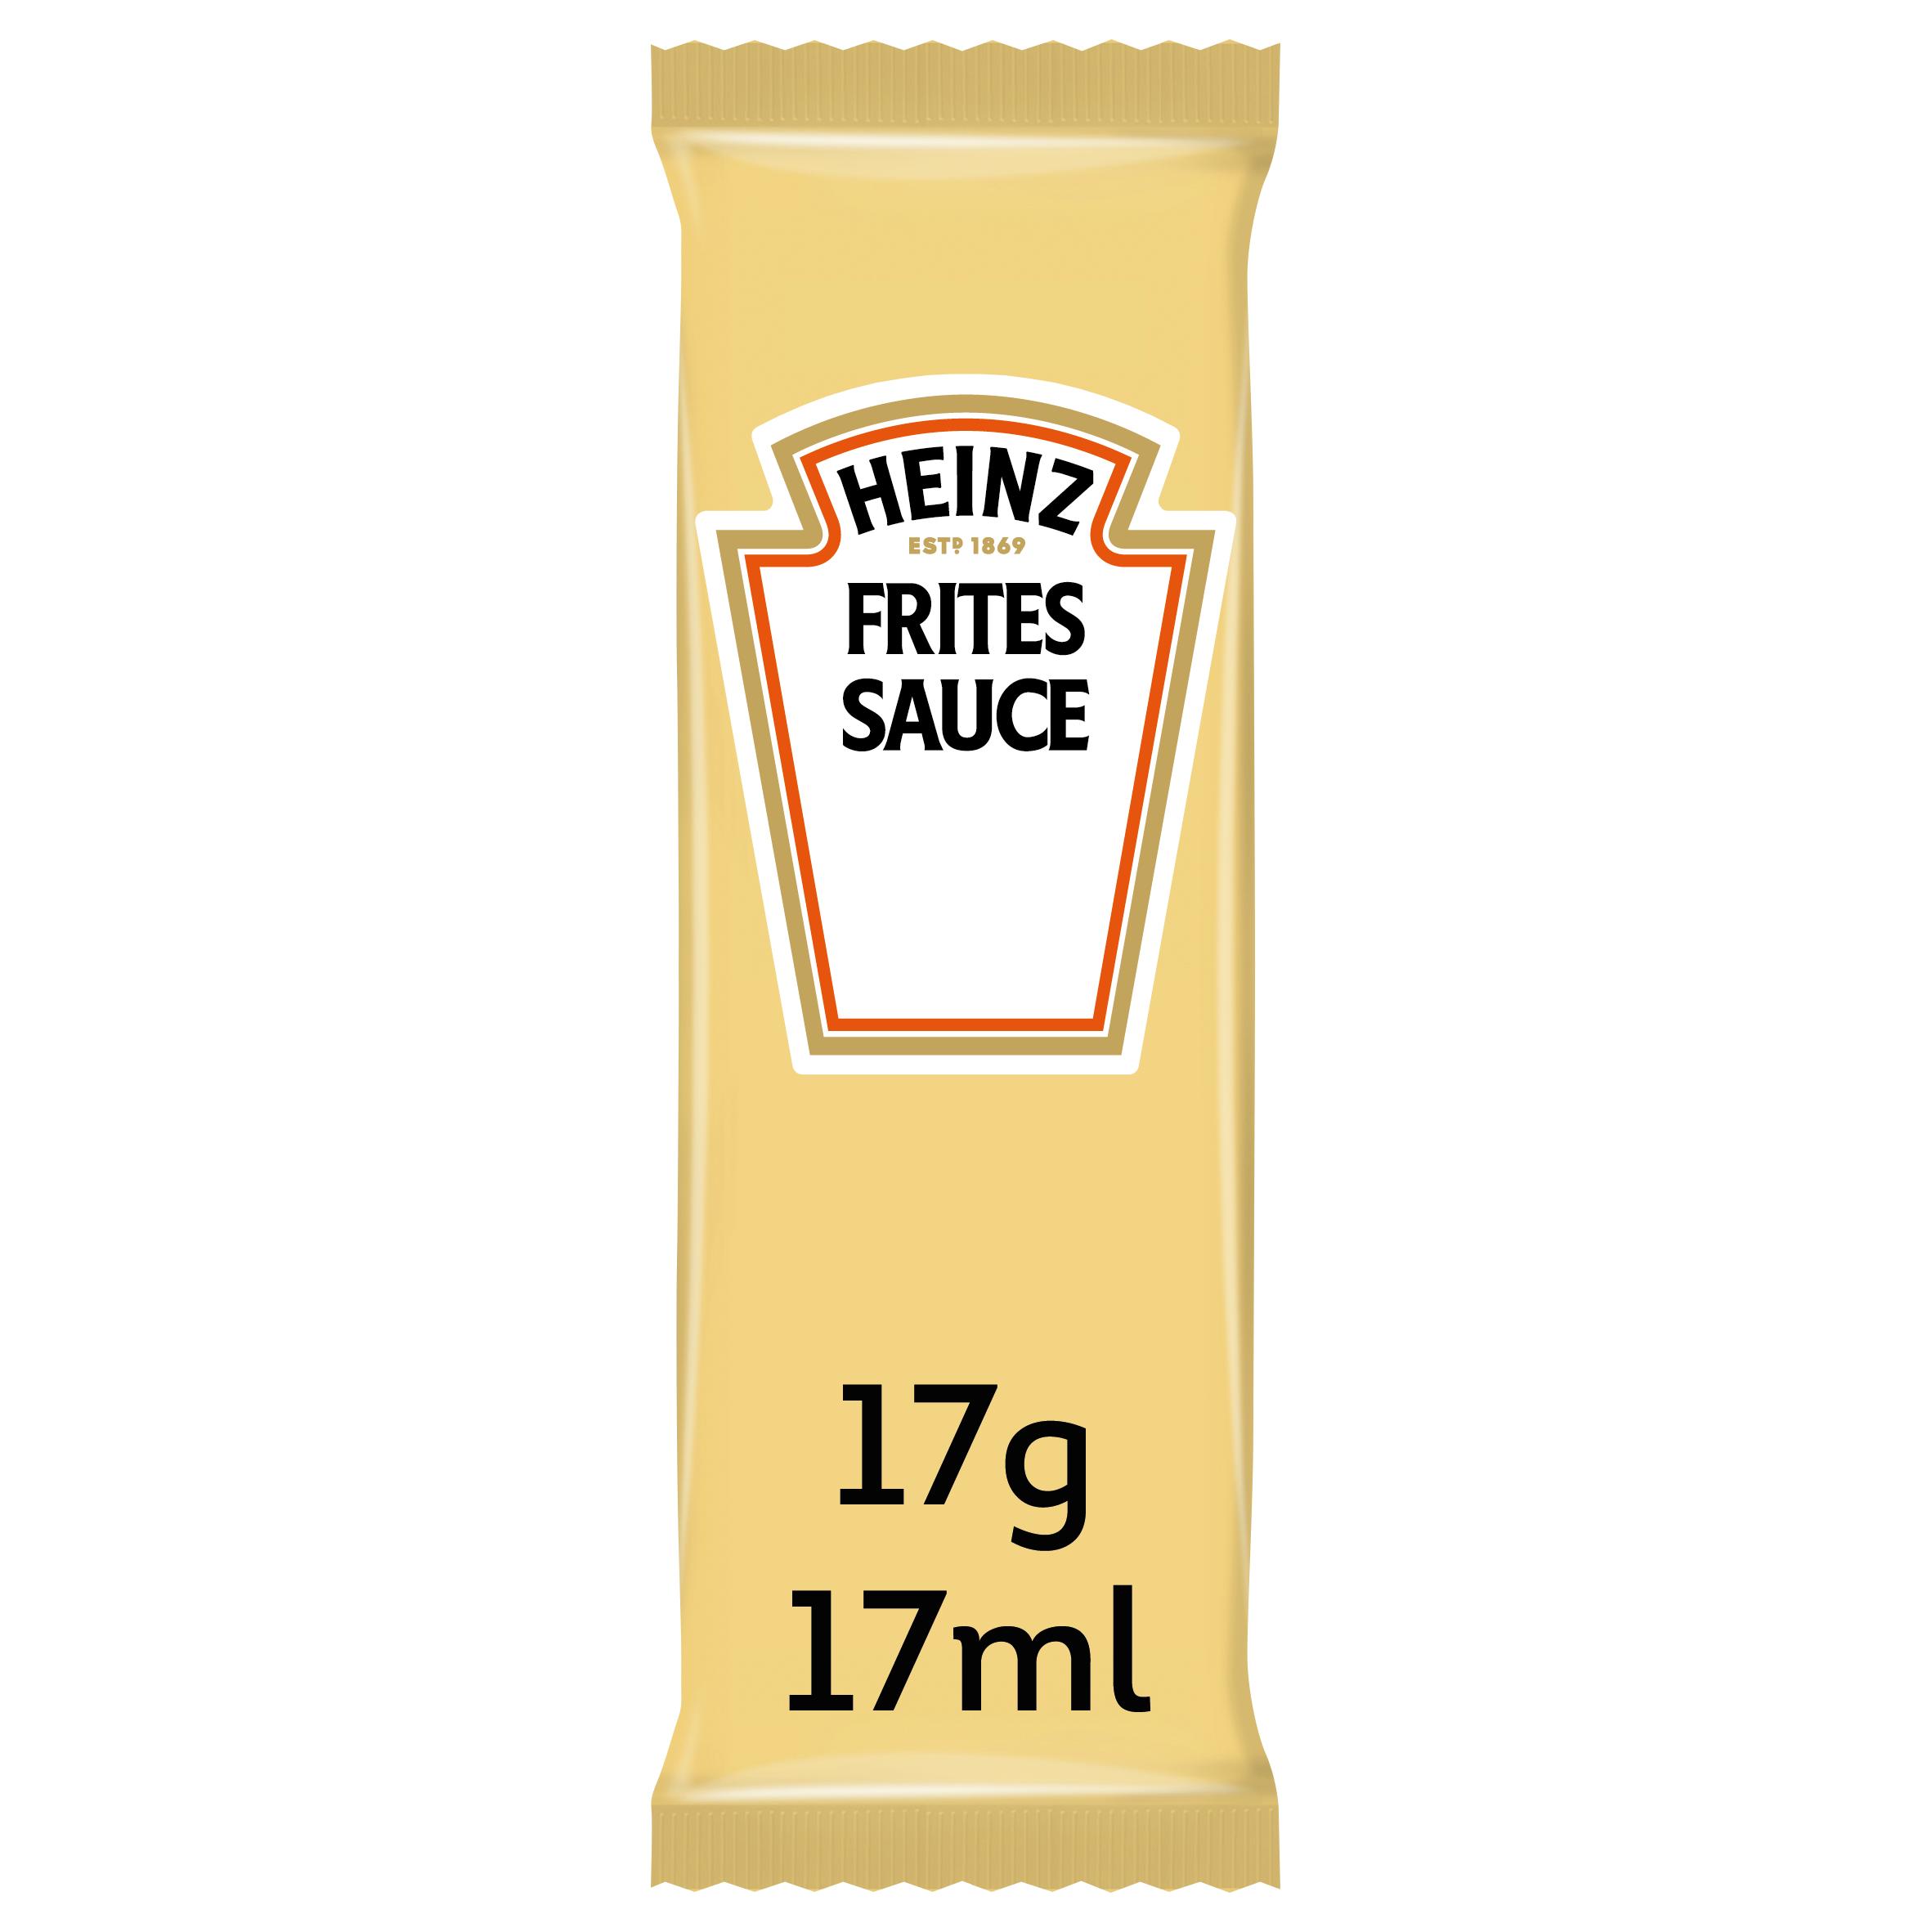 Heinz Frites Sauce17ml Sachet image